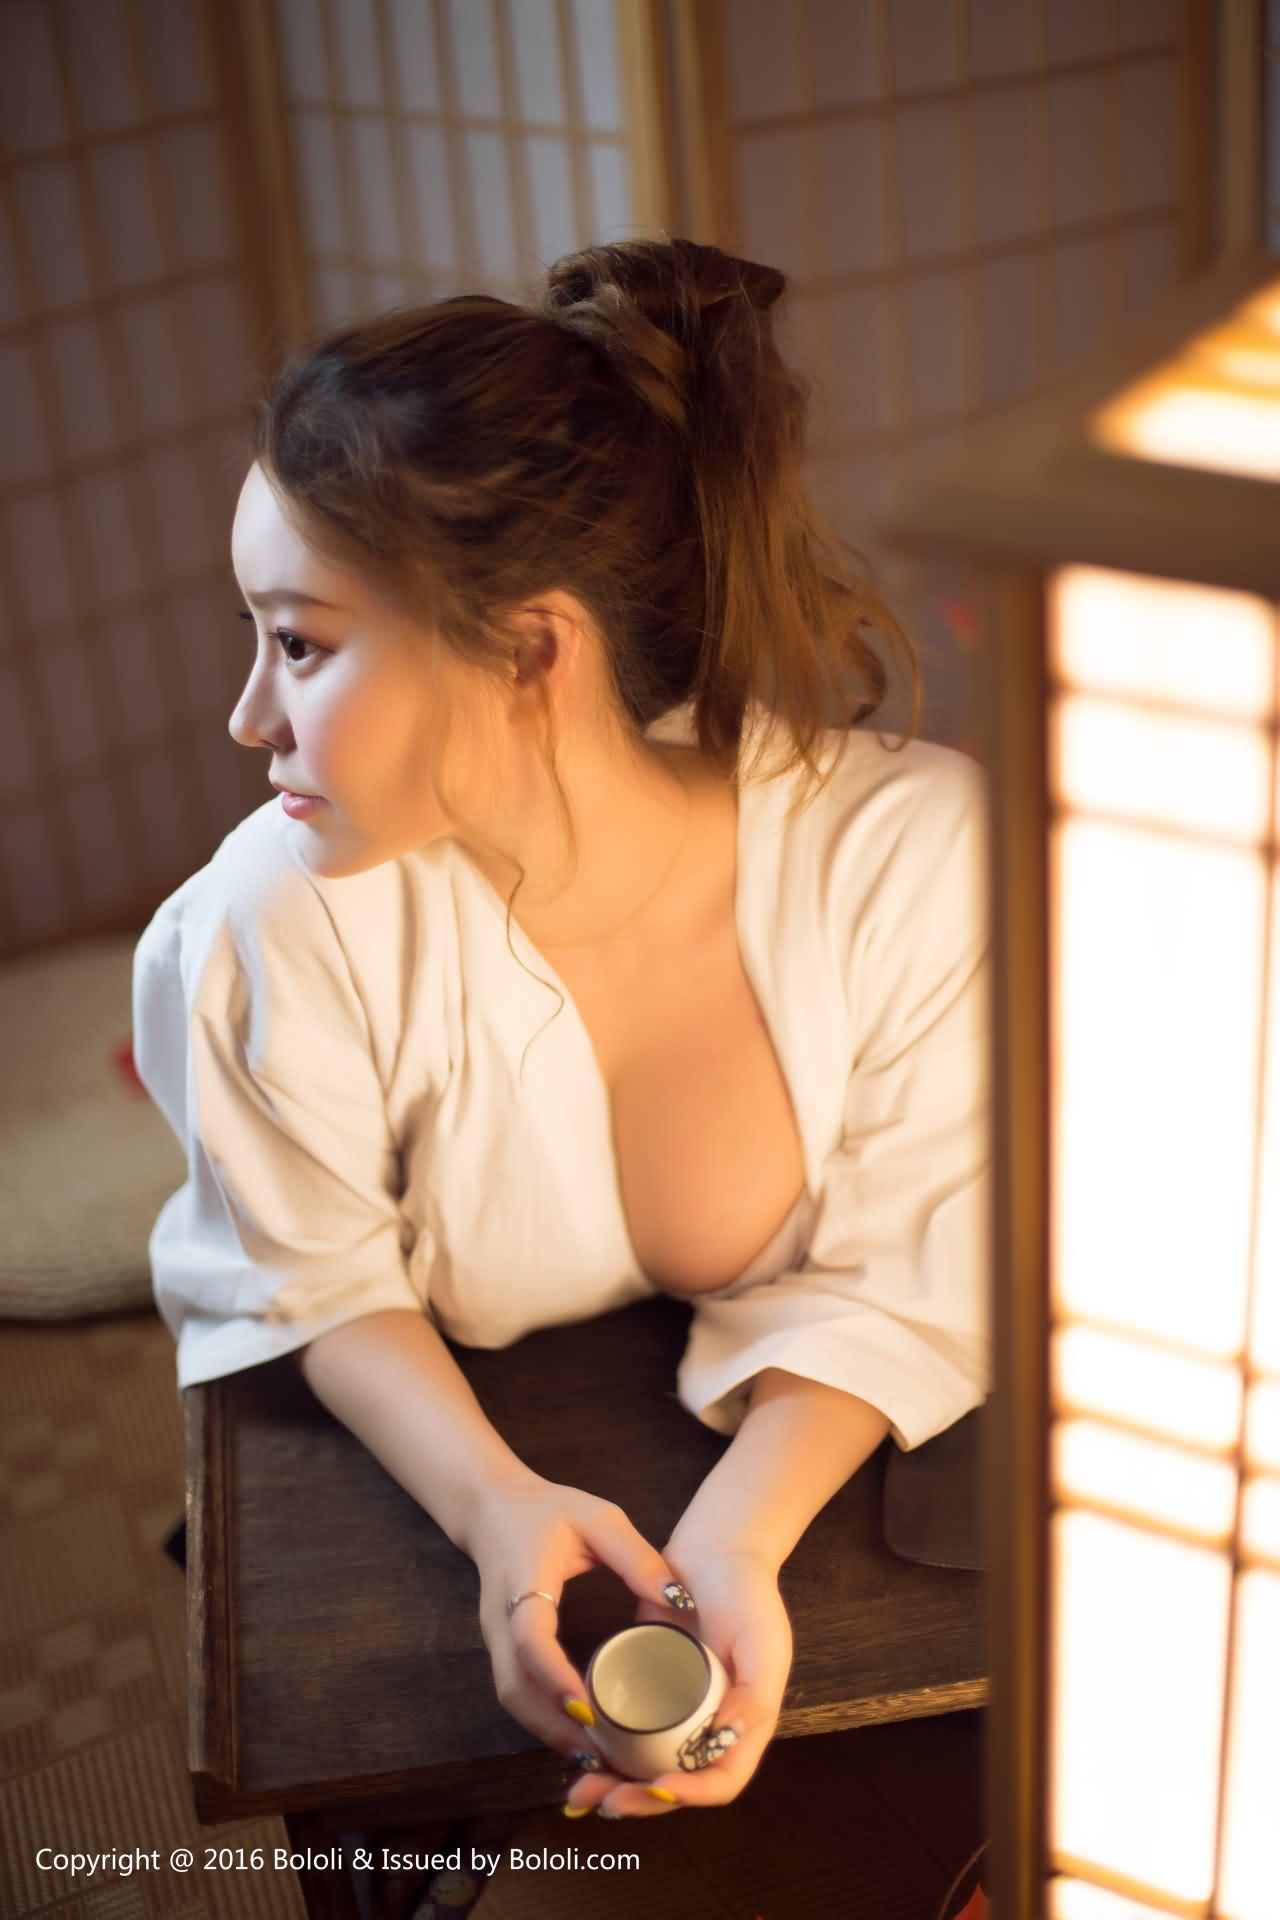 [BoLoLi波萝社] BOL.135 剣道の女 柳侑绮 2018.02.13 [25+1P-135M]